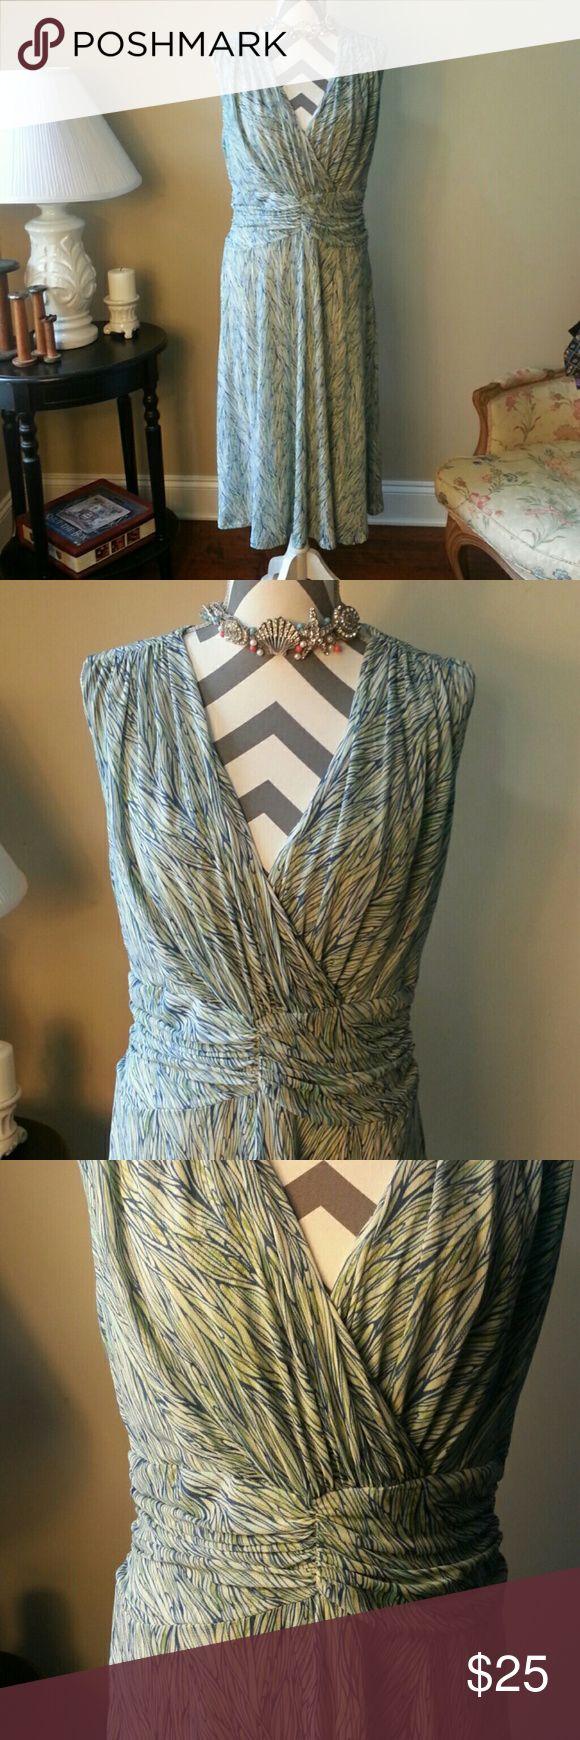 Coldwater Creek Dress Coldwater Creek dress. Rusching around waist. 100% nylon. Side zipper. Coldwater Creek Dresses